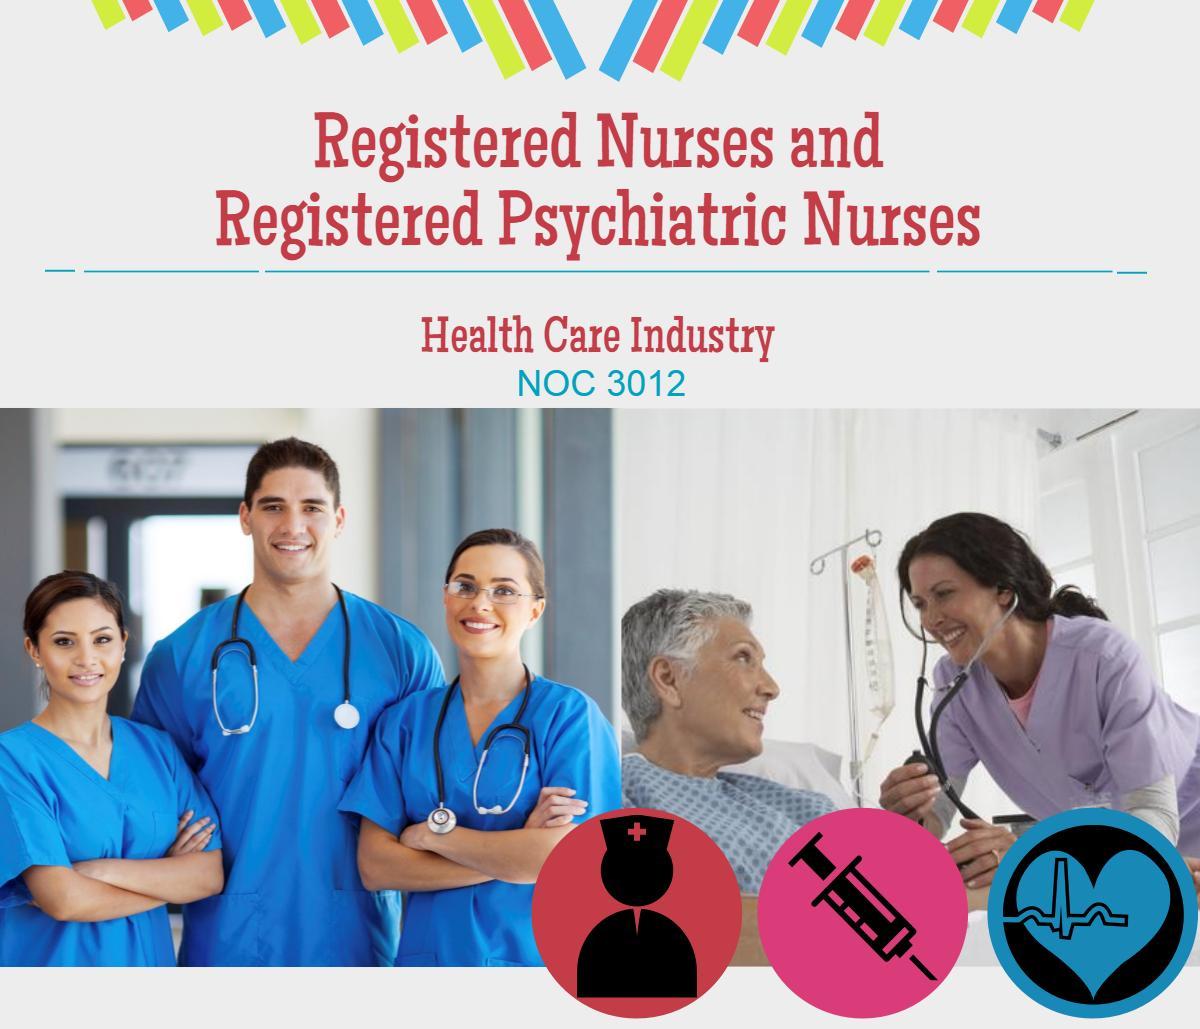 Registered Nurse and Registered Psychiatric Nurses